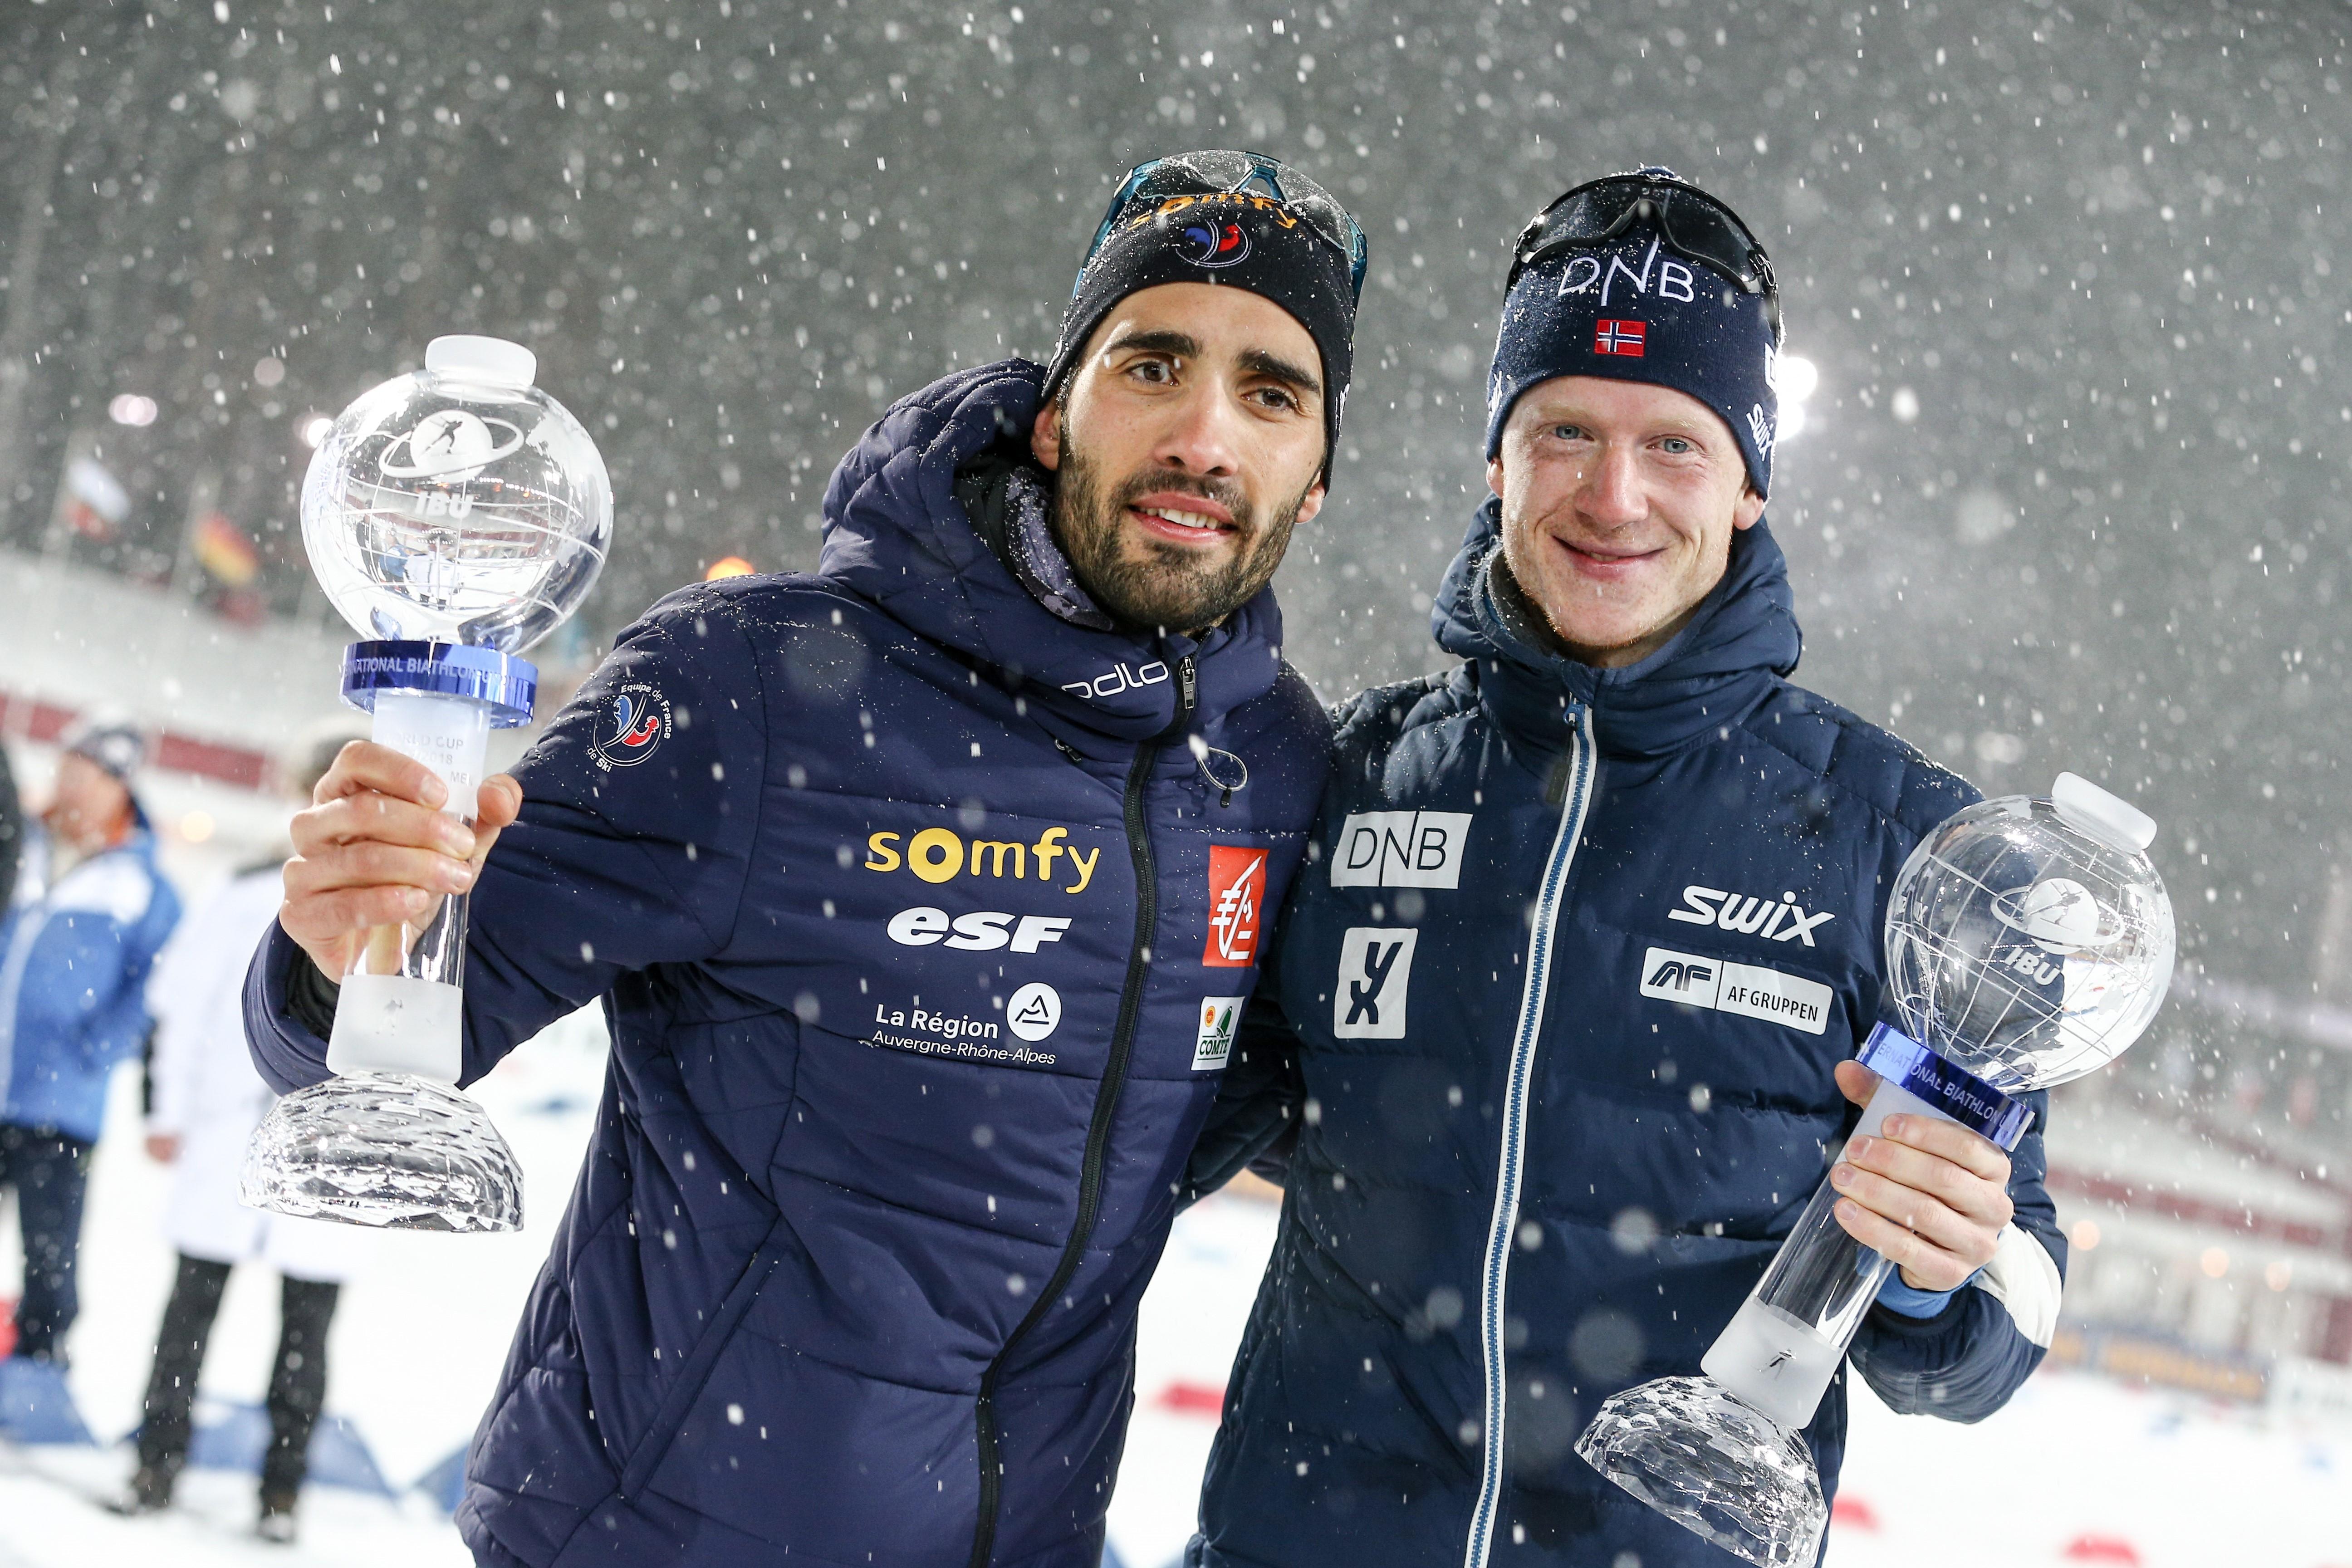 Martin Fourcade ve Johannes Thingnes Boe